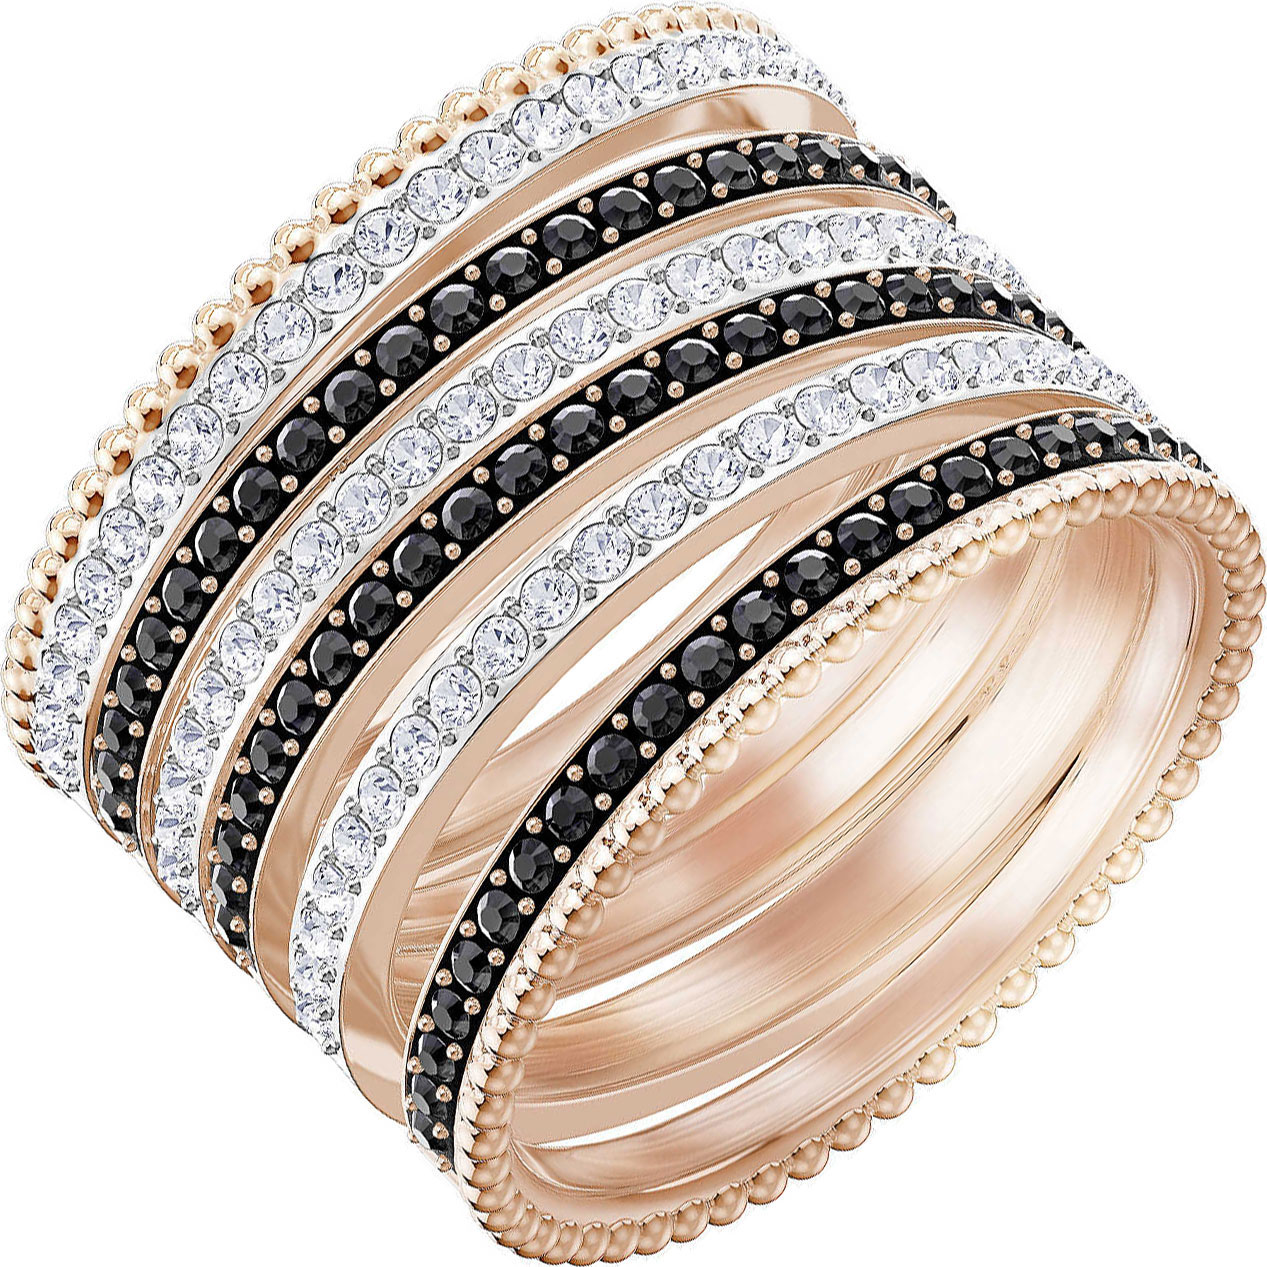 Кольца Swarovski 5409182 swarovski swarovski кольца кольца романтический элегантный минималистский аксессуары no 503291552